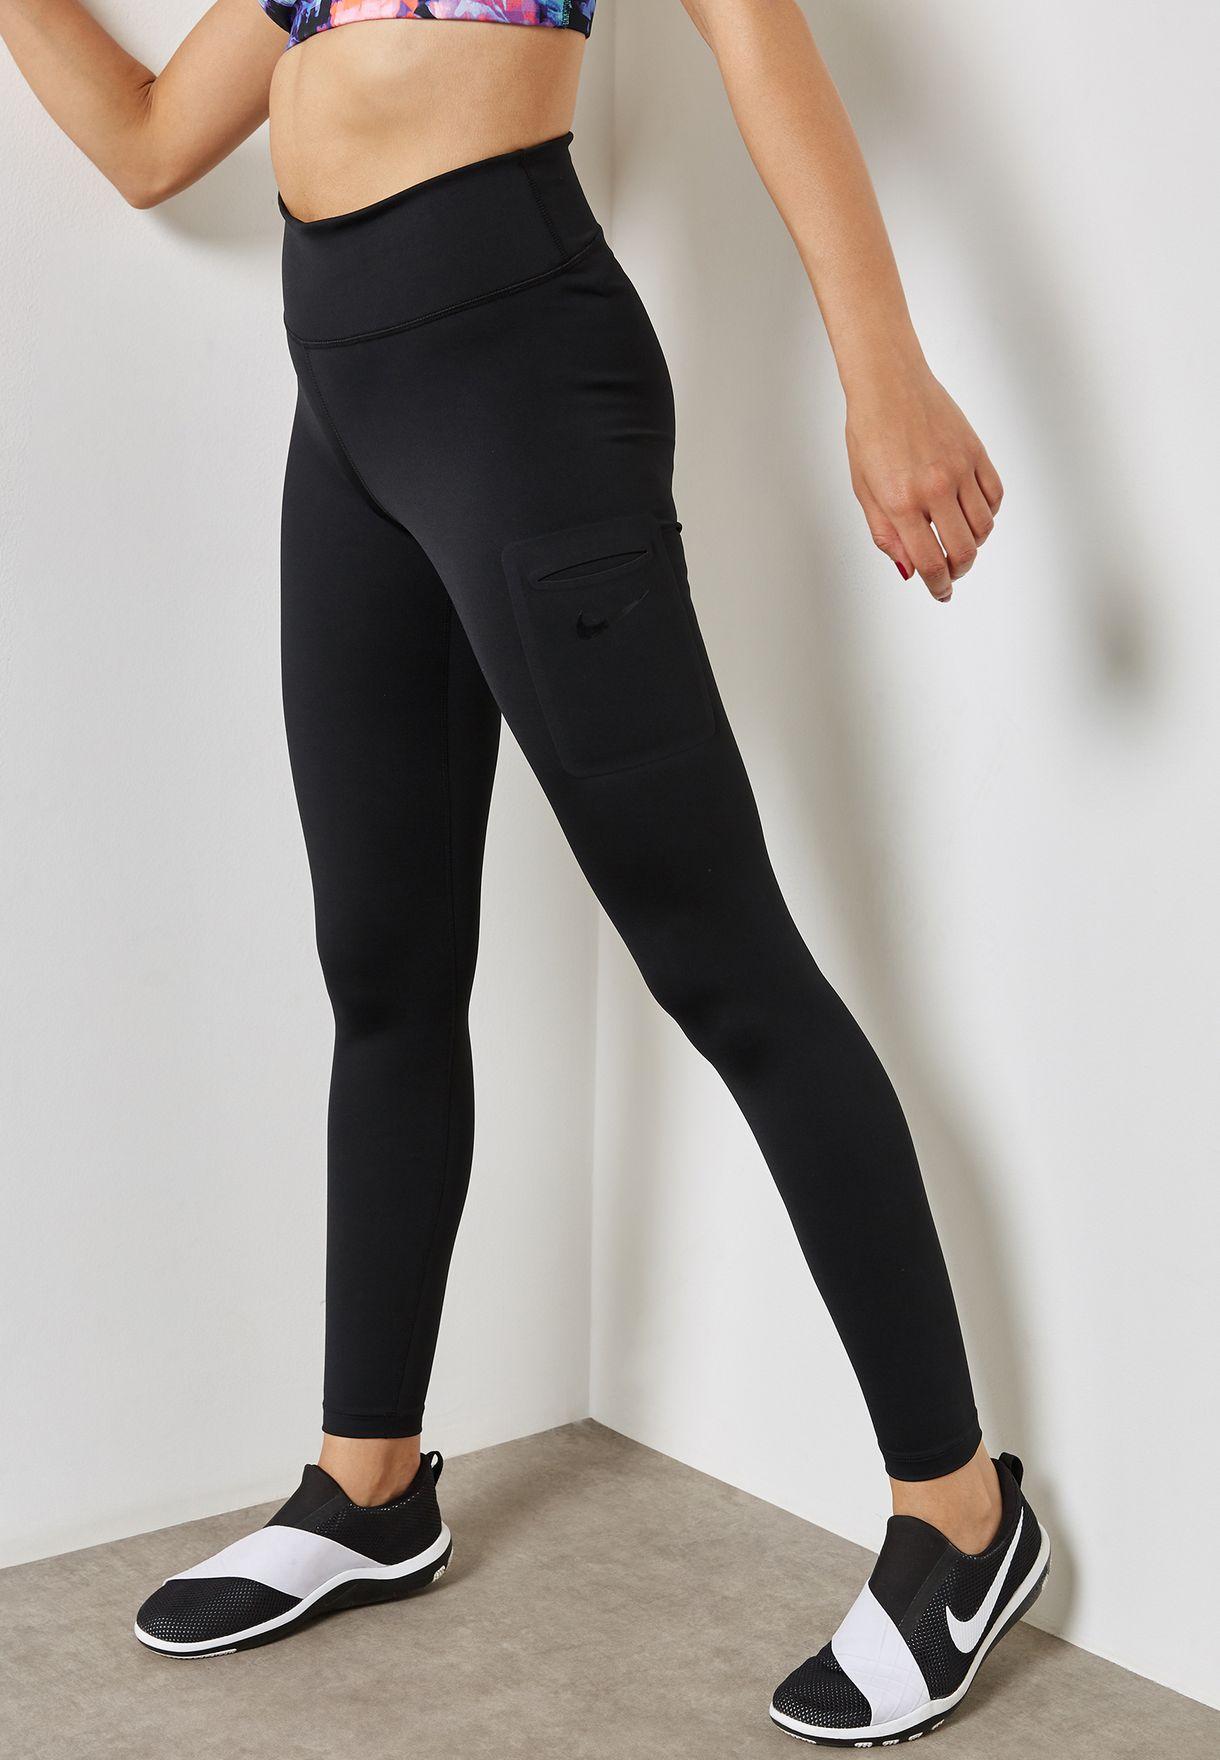 8e4ca857f8dba Shop Nike black Power Hyper Tights 933497-010 for Women in UAE ...